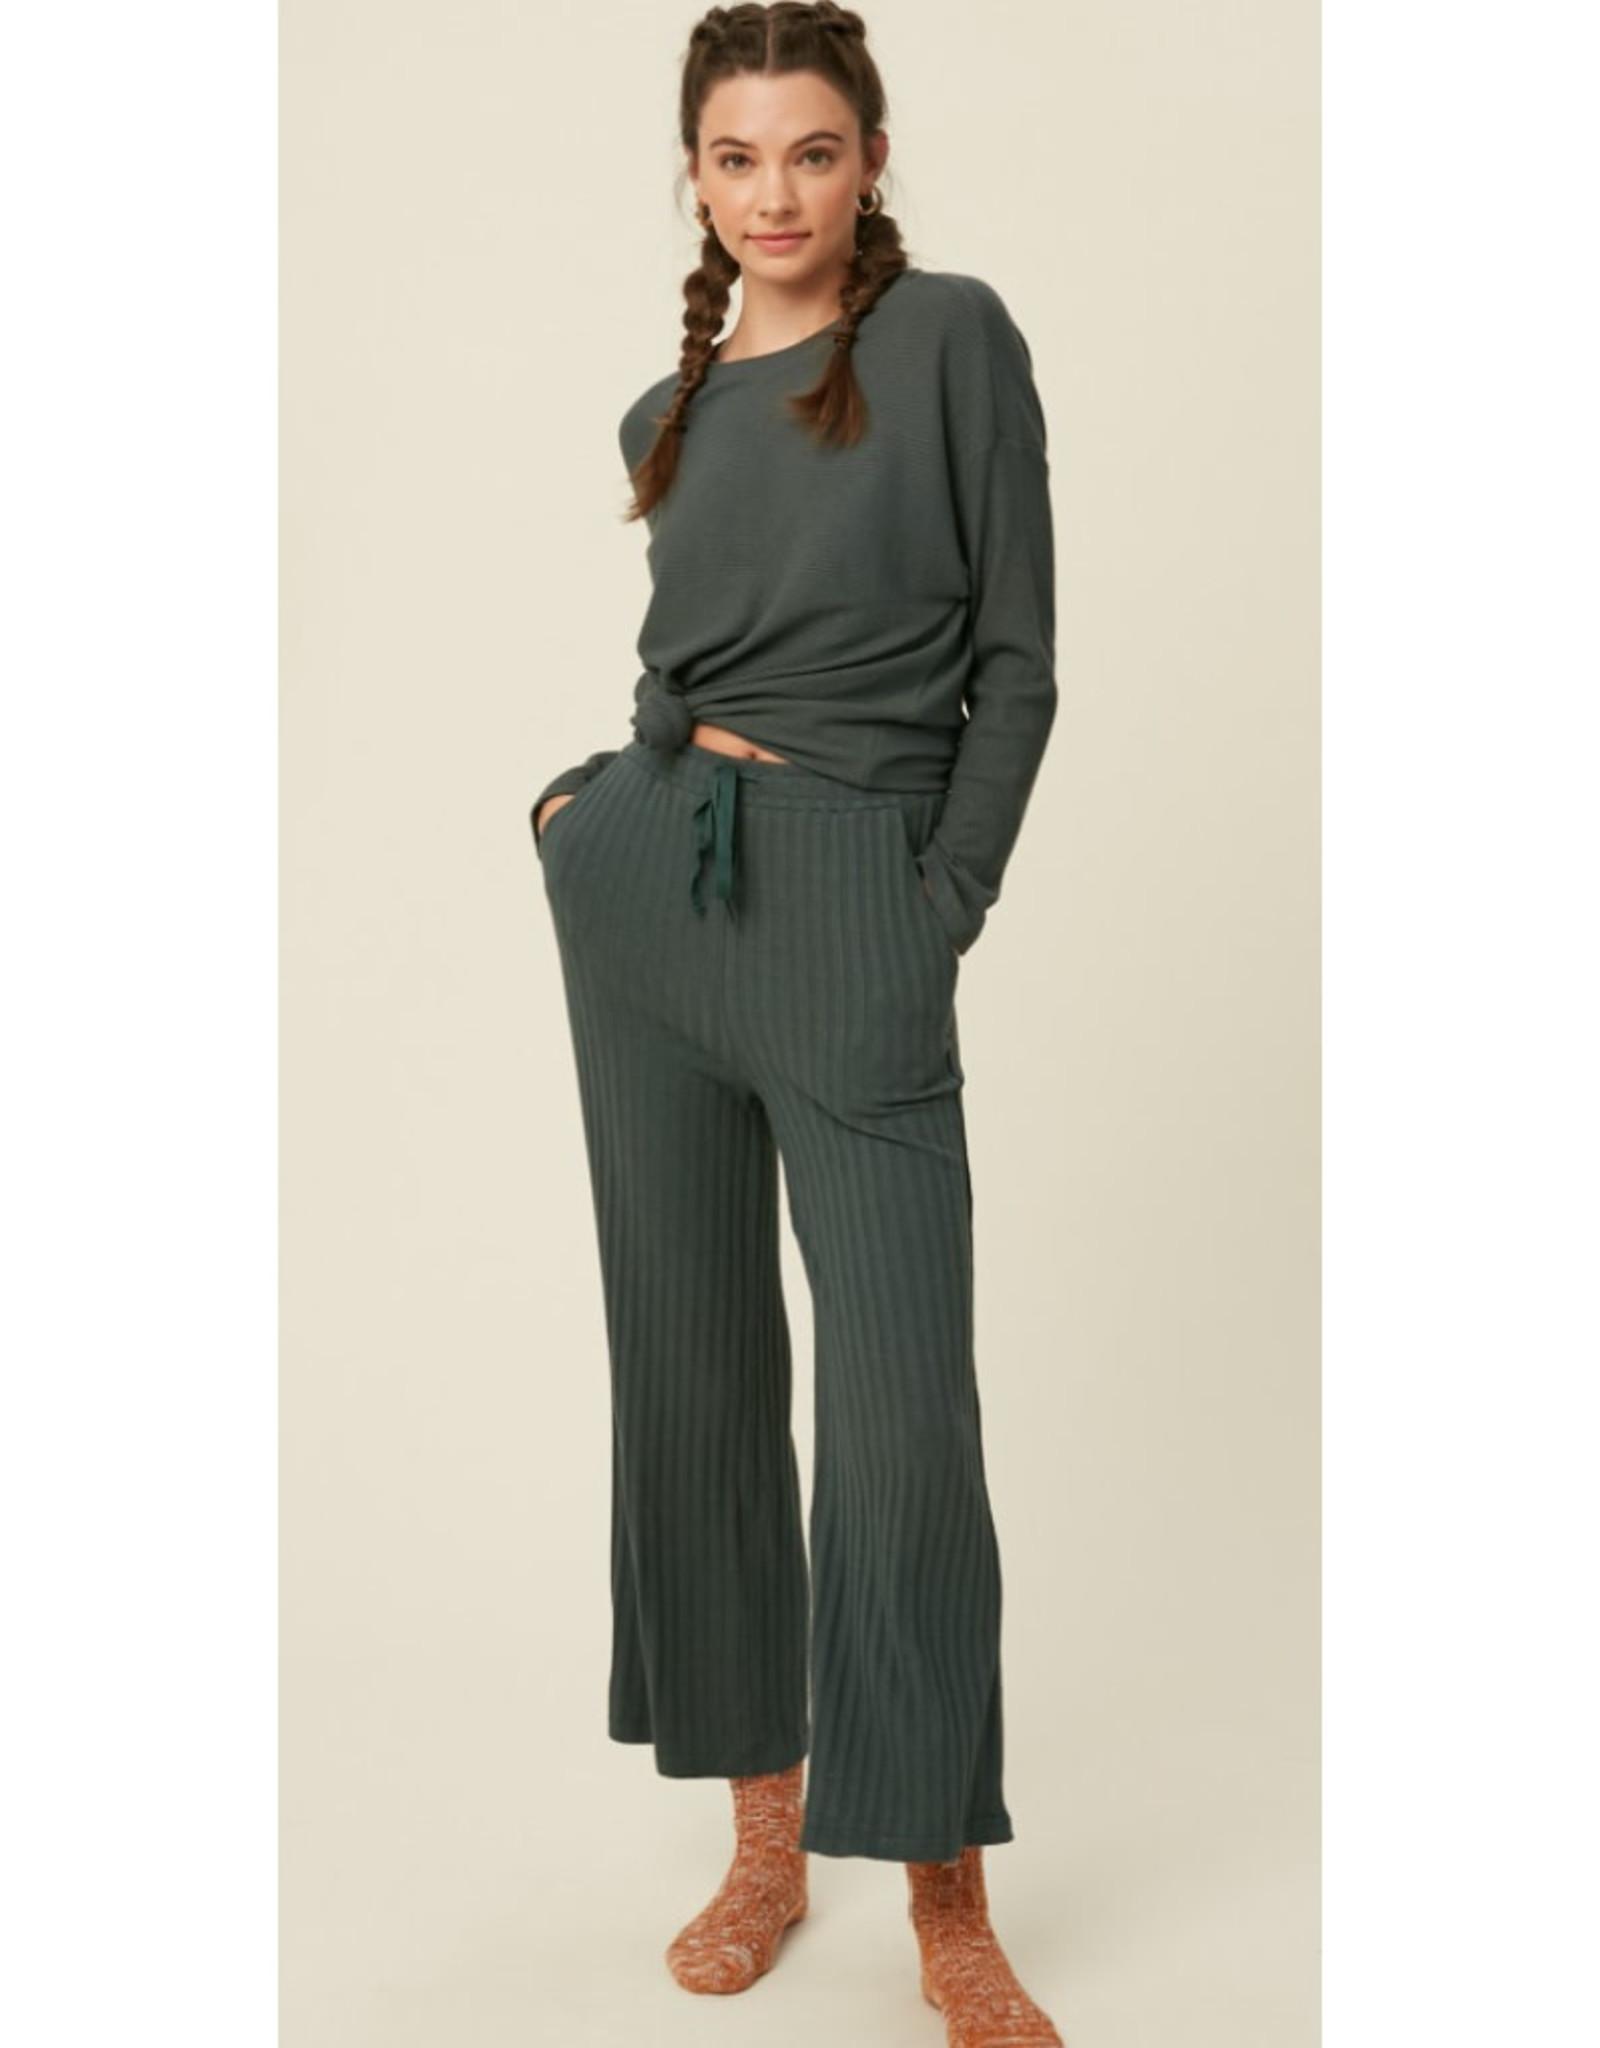 Ribbed Knit Lounge Pant